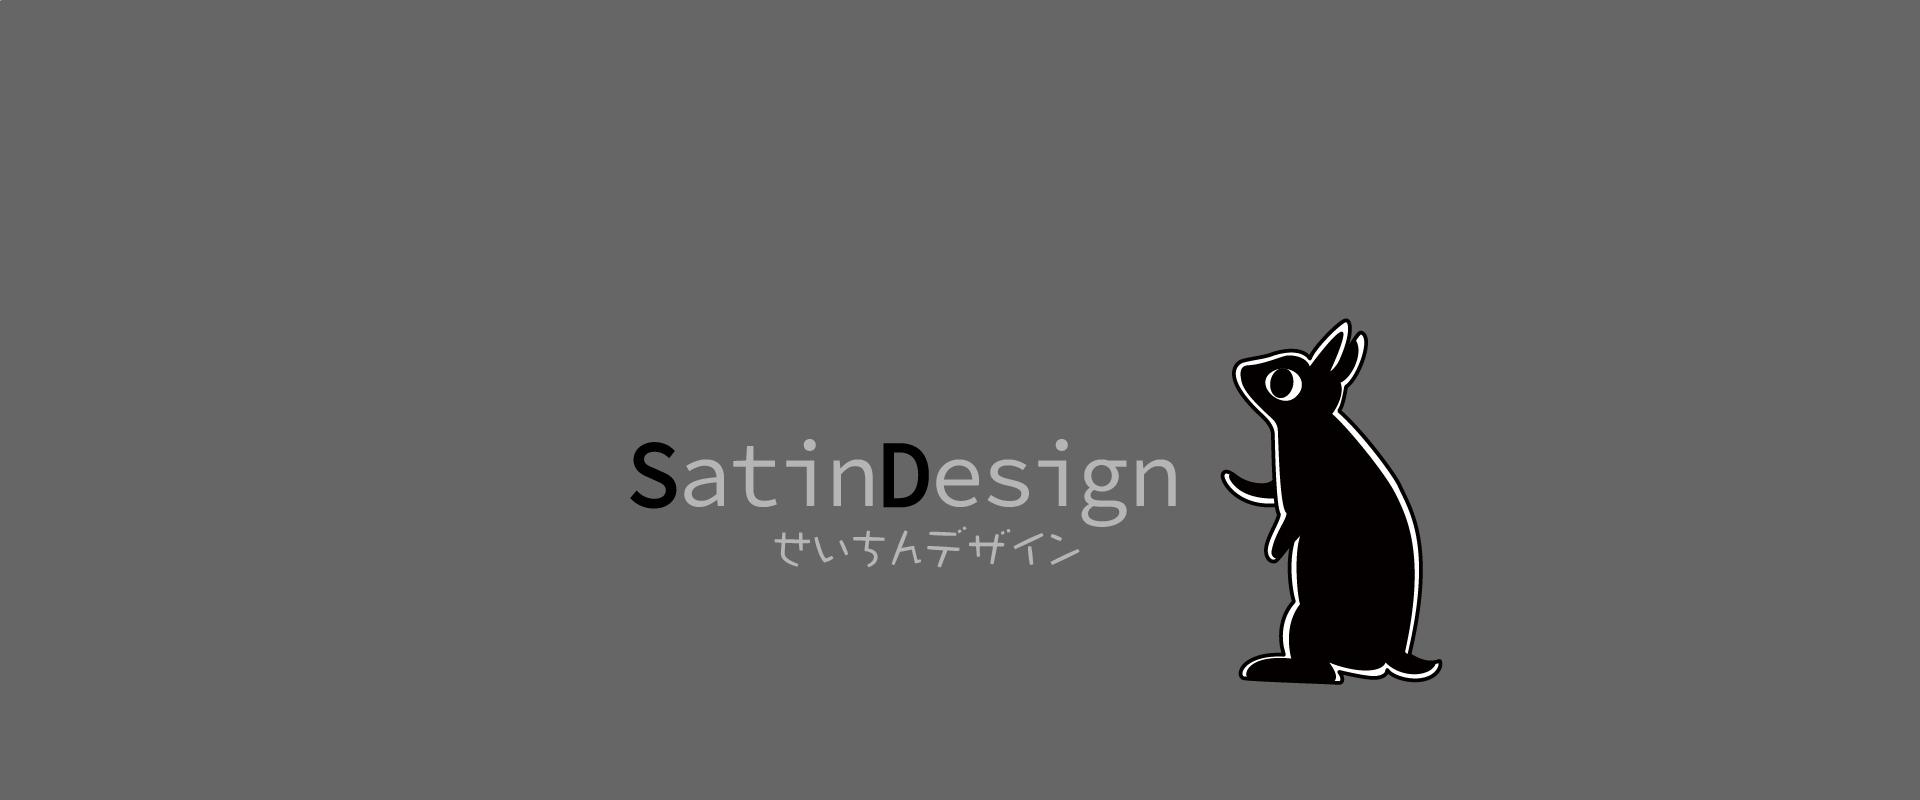 SatinDesign